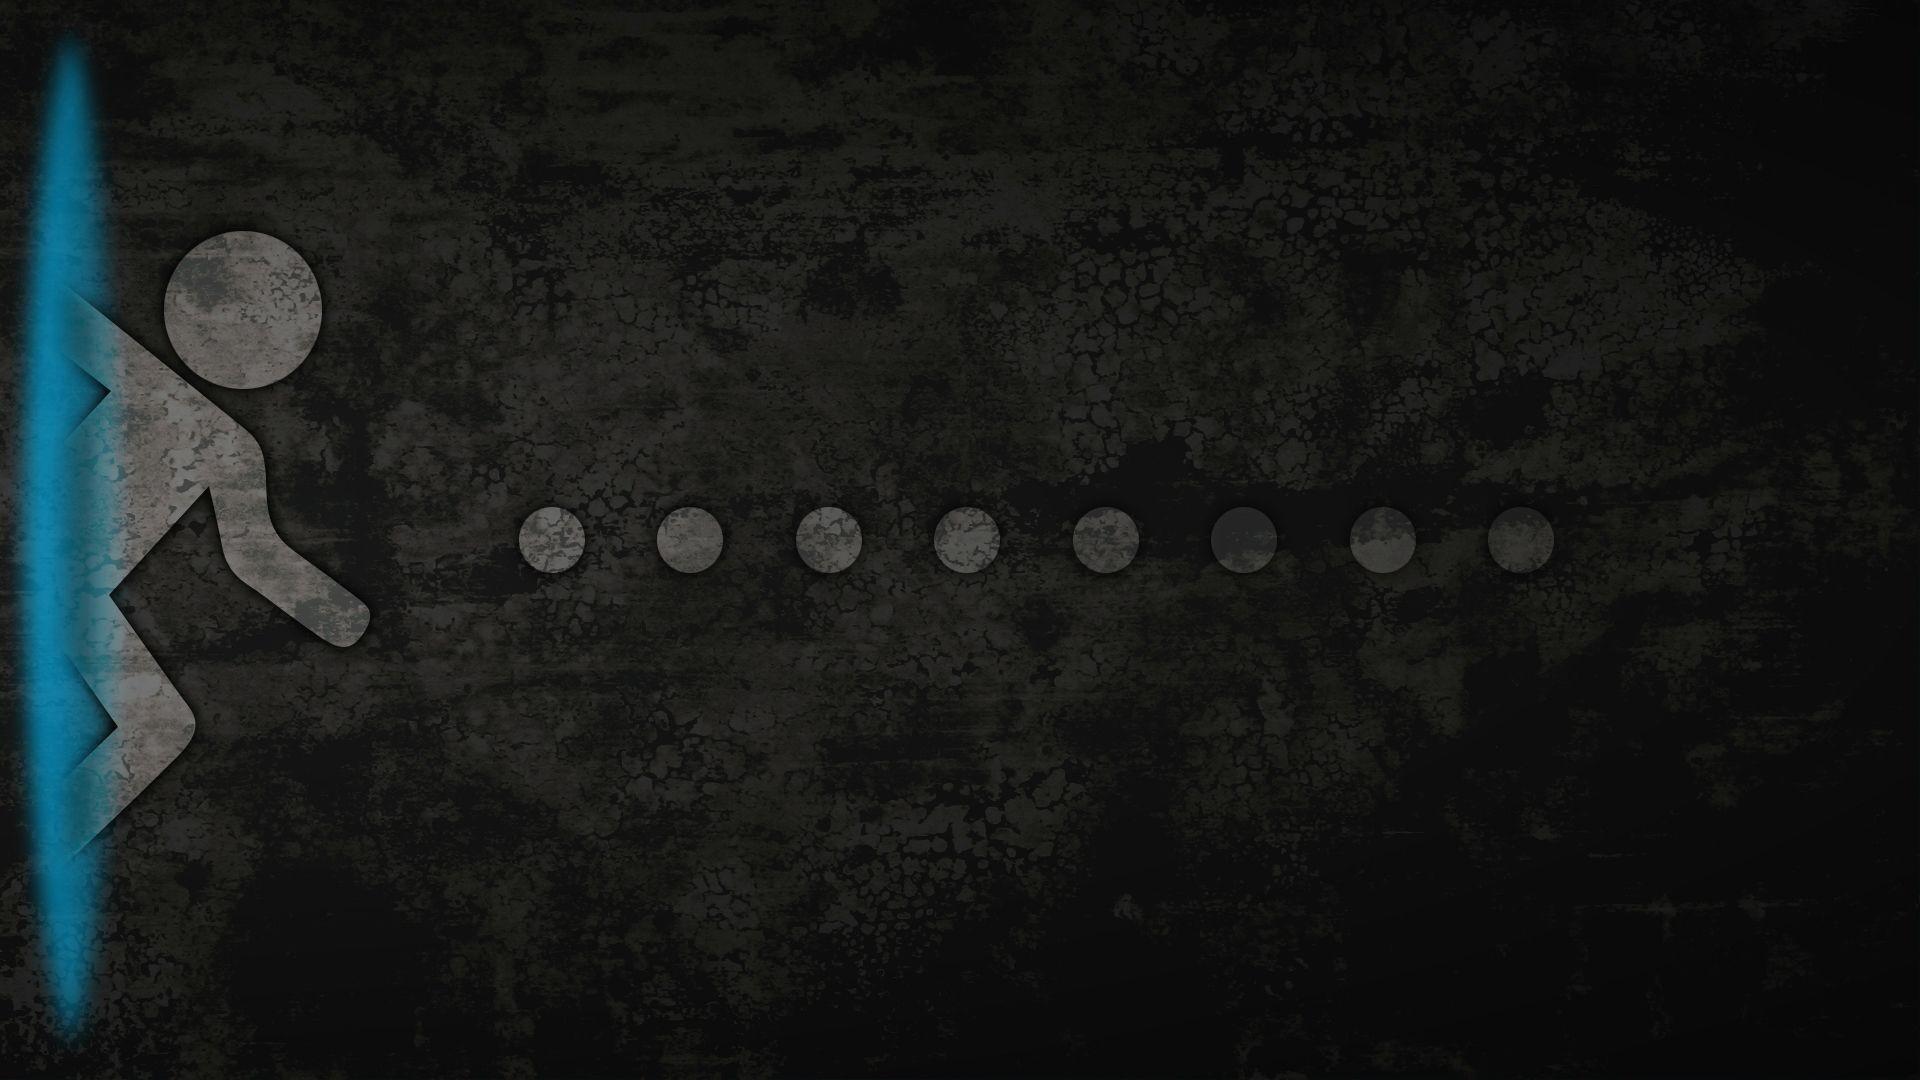 gaming wallpaper 1920x1080